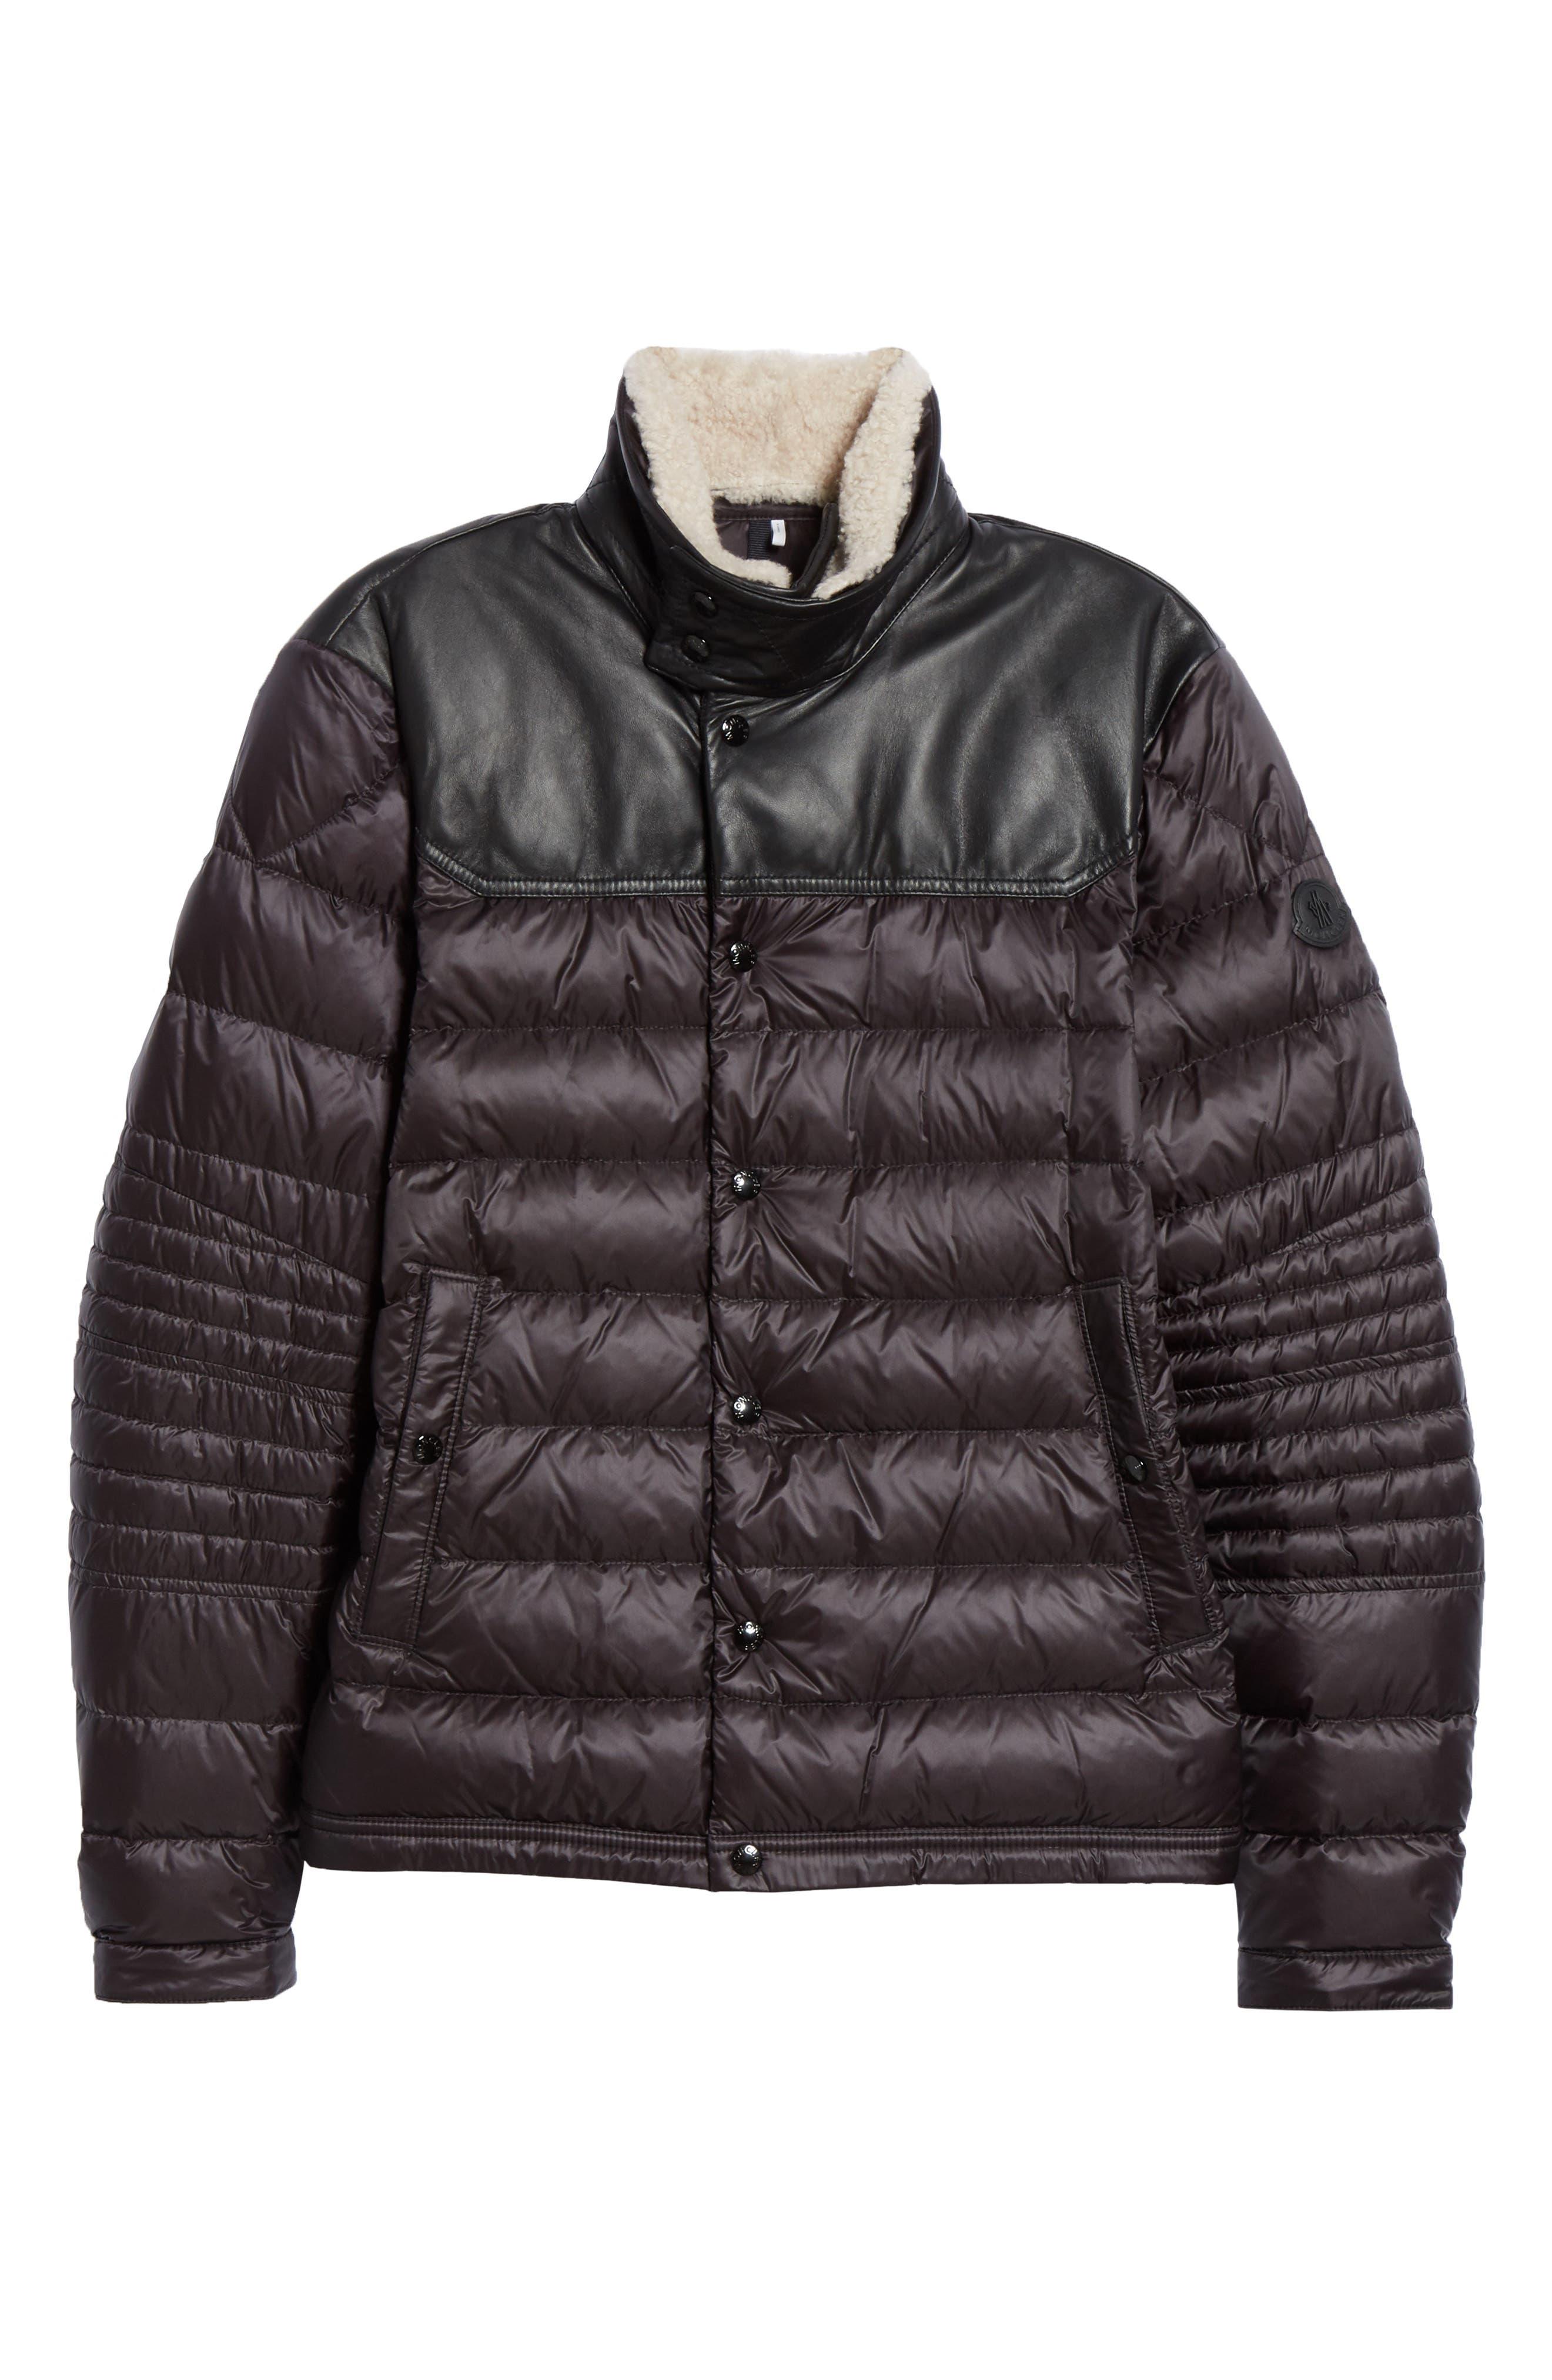 MONCLER, Vasserot Genuine Shearling Collar Jacket, Alternate thumbnail 6, color, BLACK